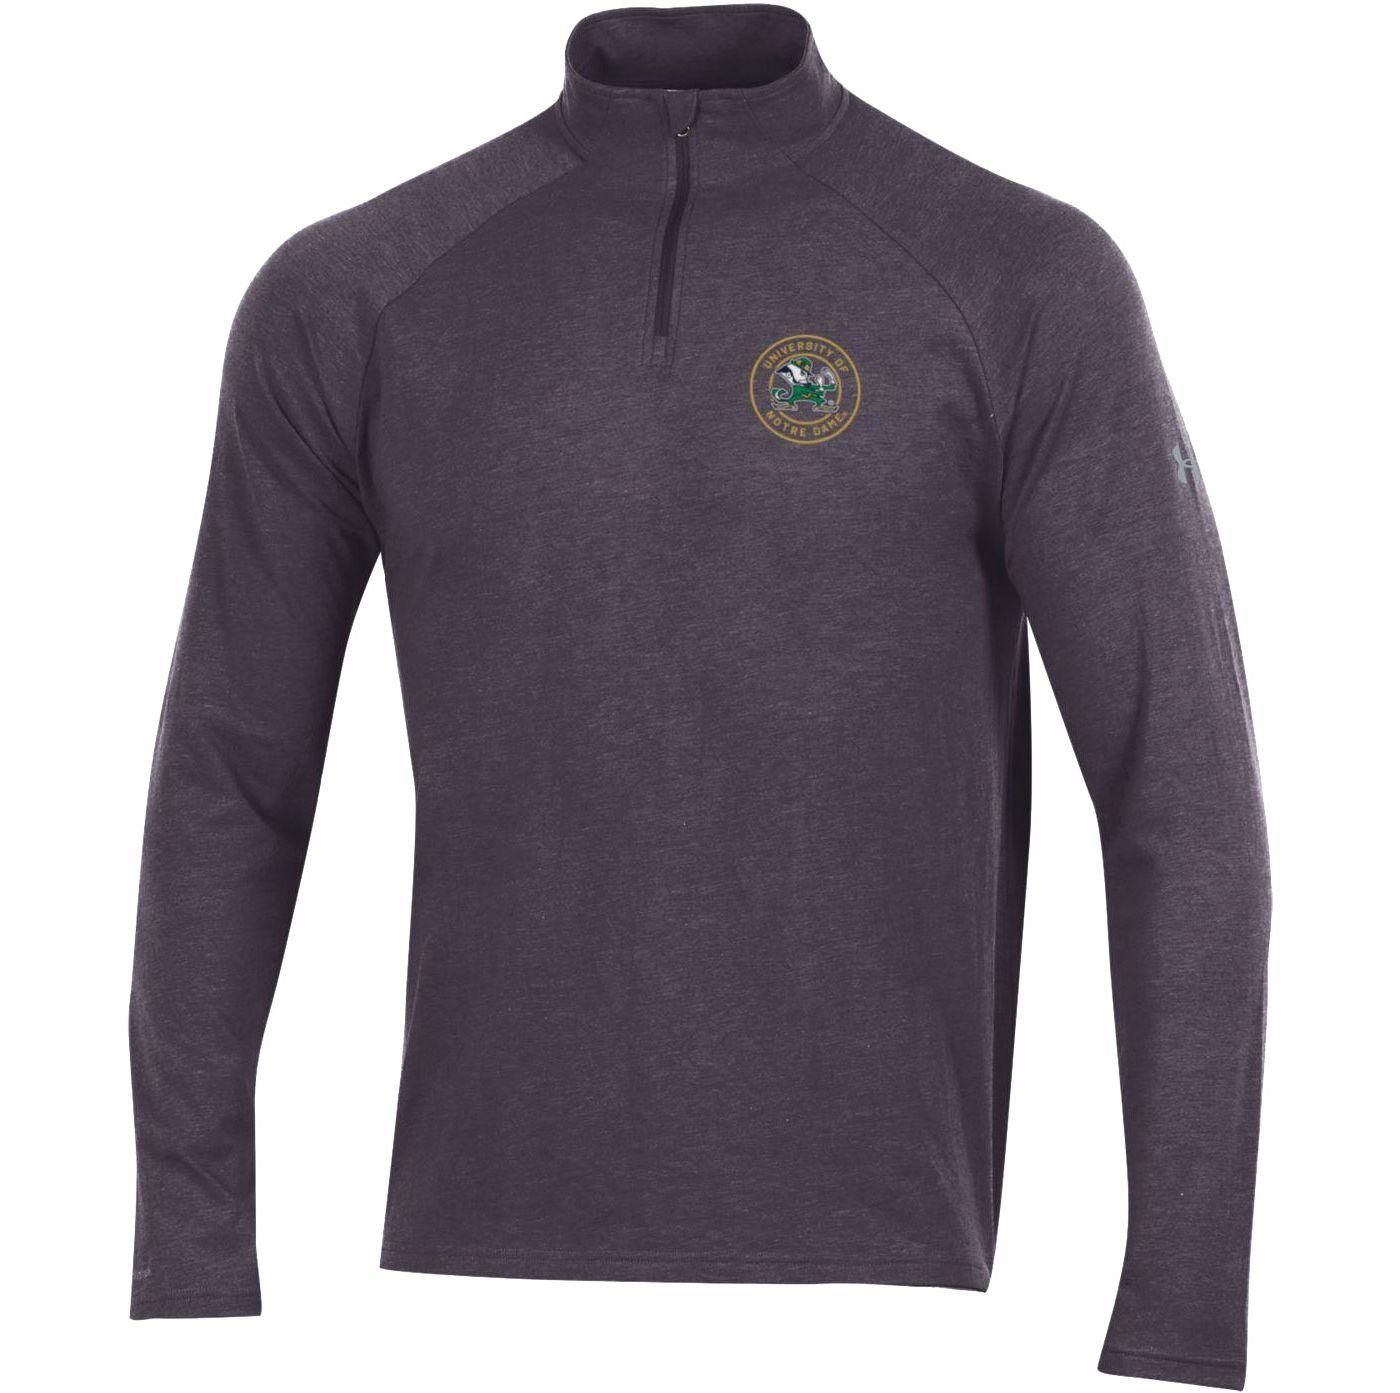 Under Armour Men's Notre Dame Fighting Irish Grey Charged Cotton Quarter-Zip Shirt